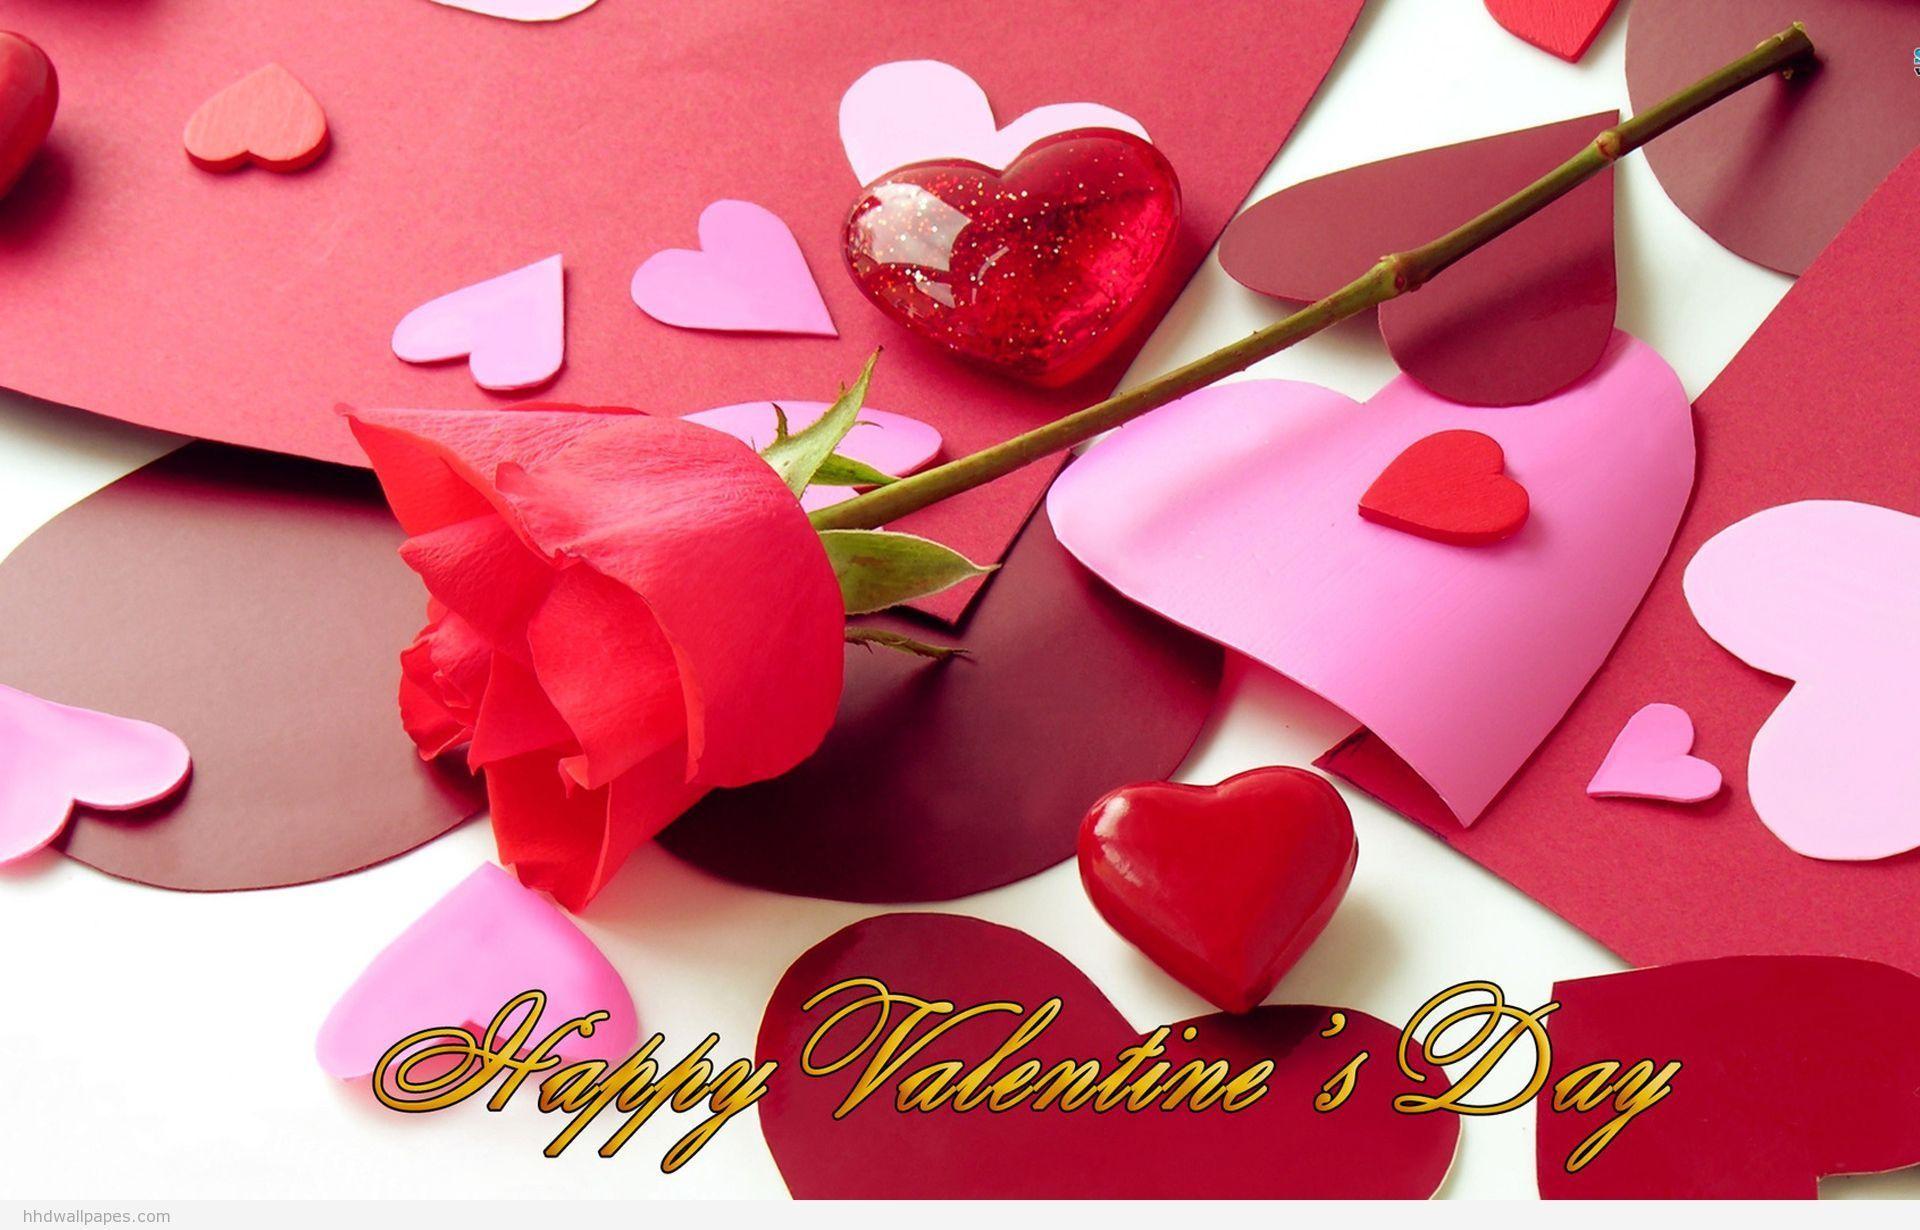 Valentine Day Love Wallpapers Hd Hd Wallpapers Desktop Wallpapers .